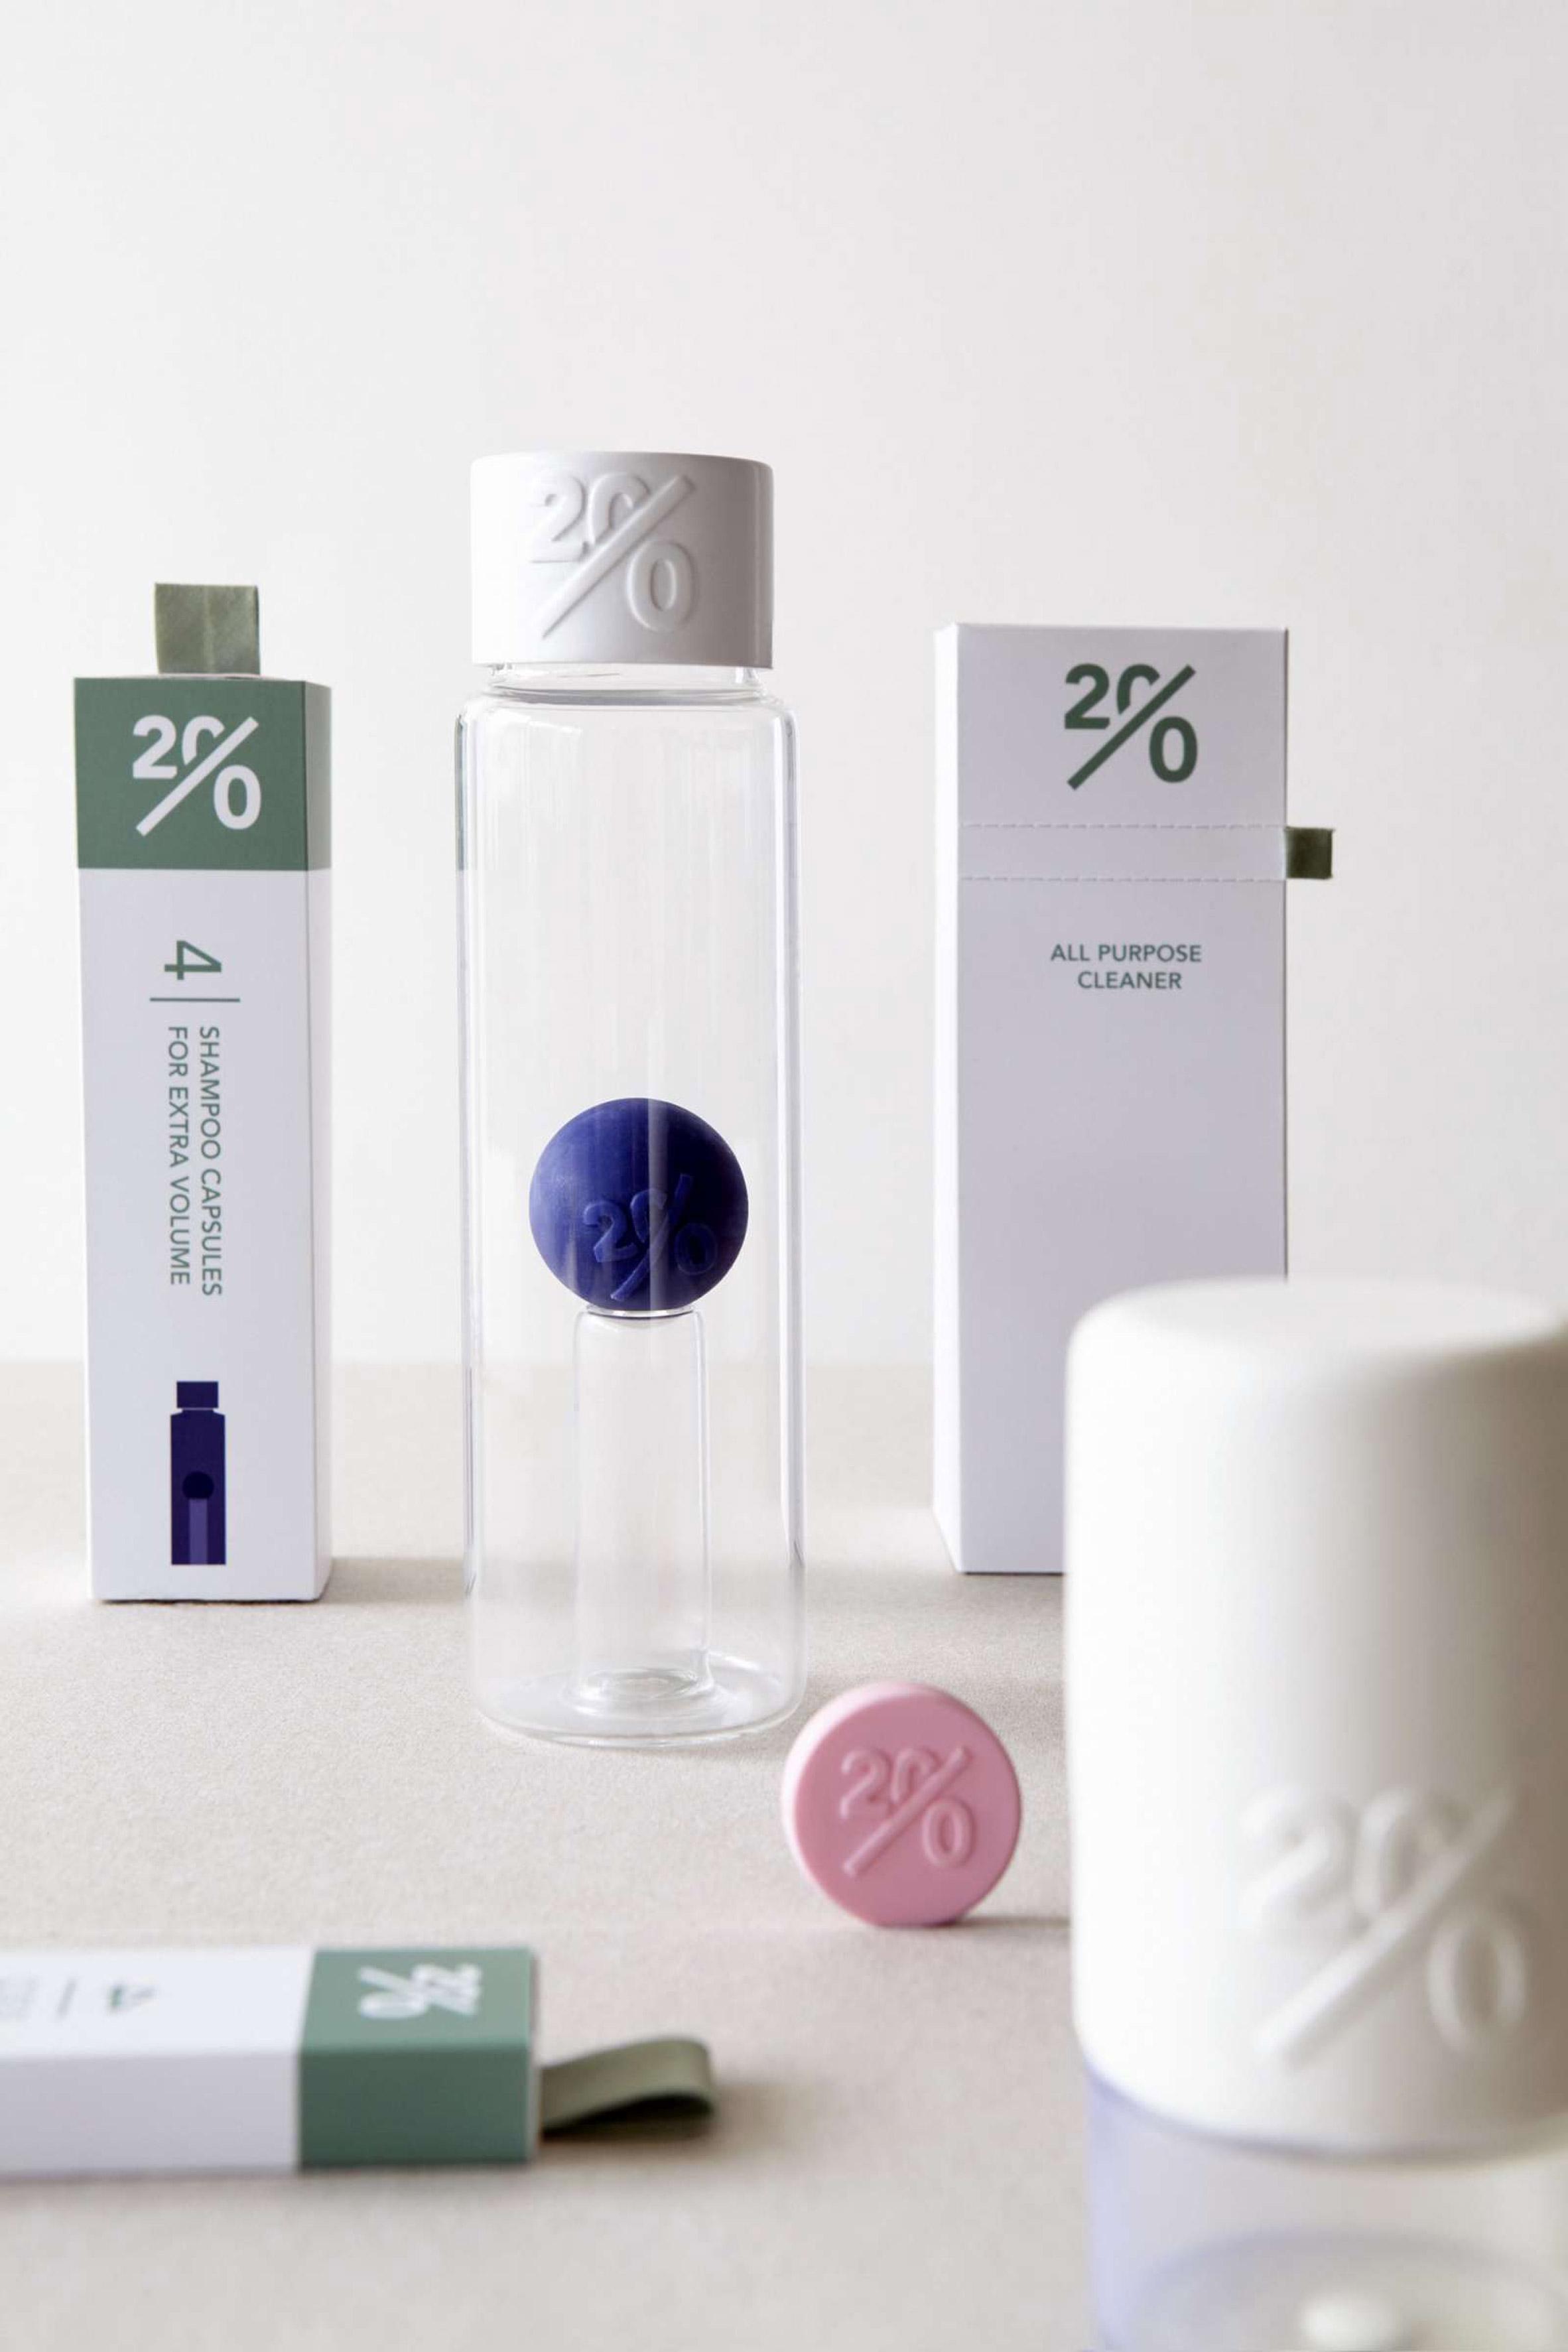 Mirjam de Bruijn turns household cleaning products into waterless capsules